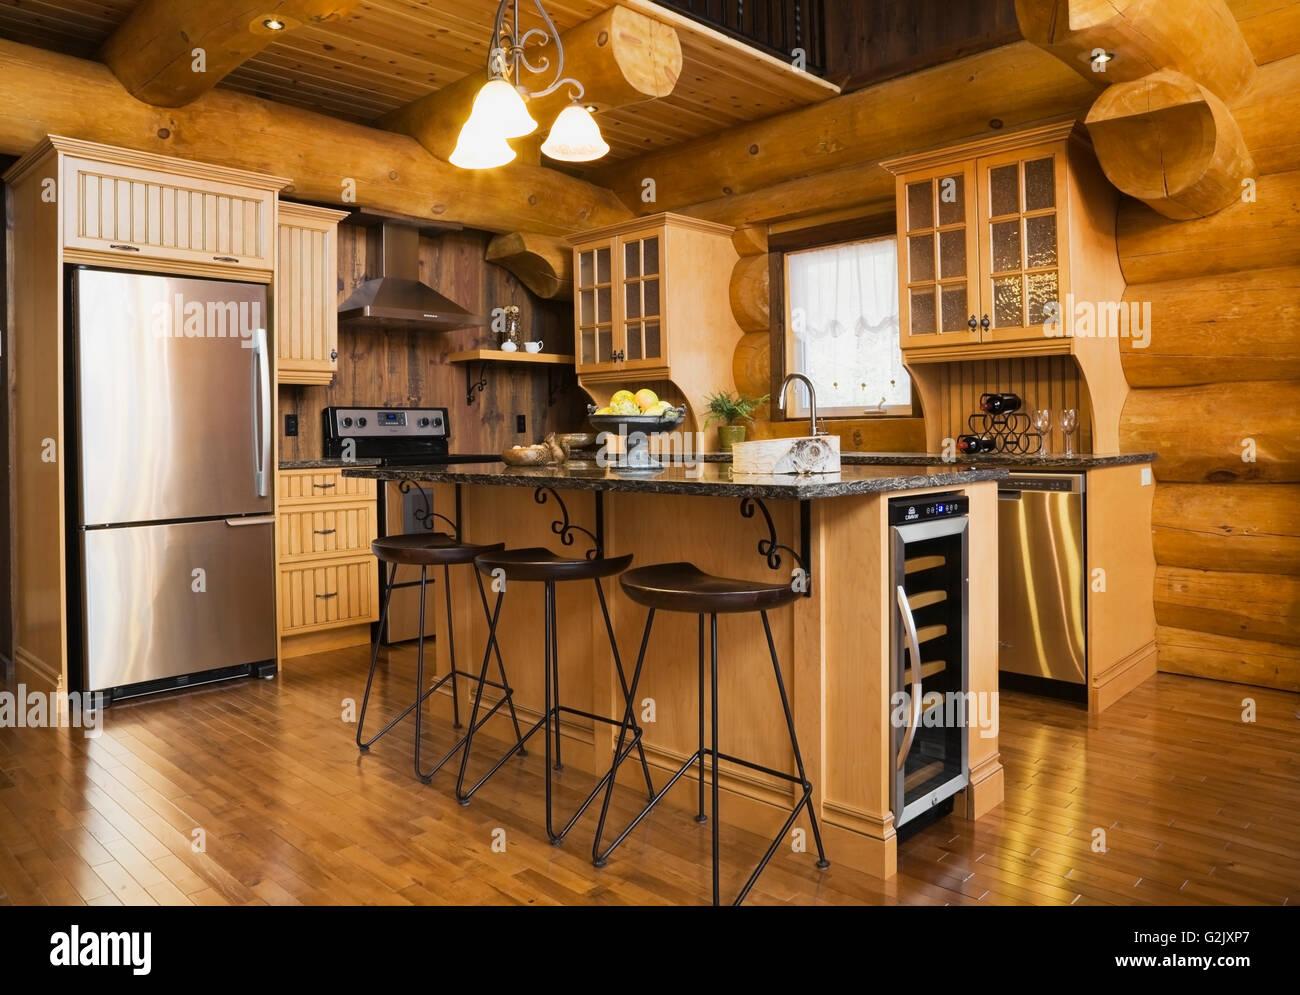 gav th carolina src metal b home shopladder stools counter bcct bar of furniture stool set cottage prod sears cdls com in